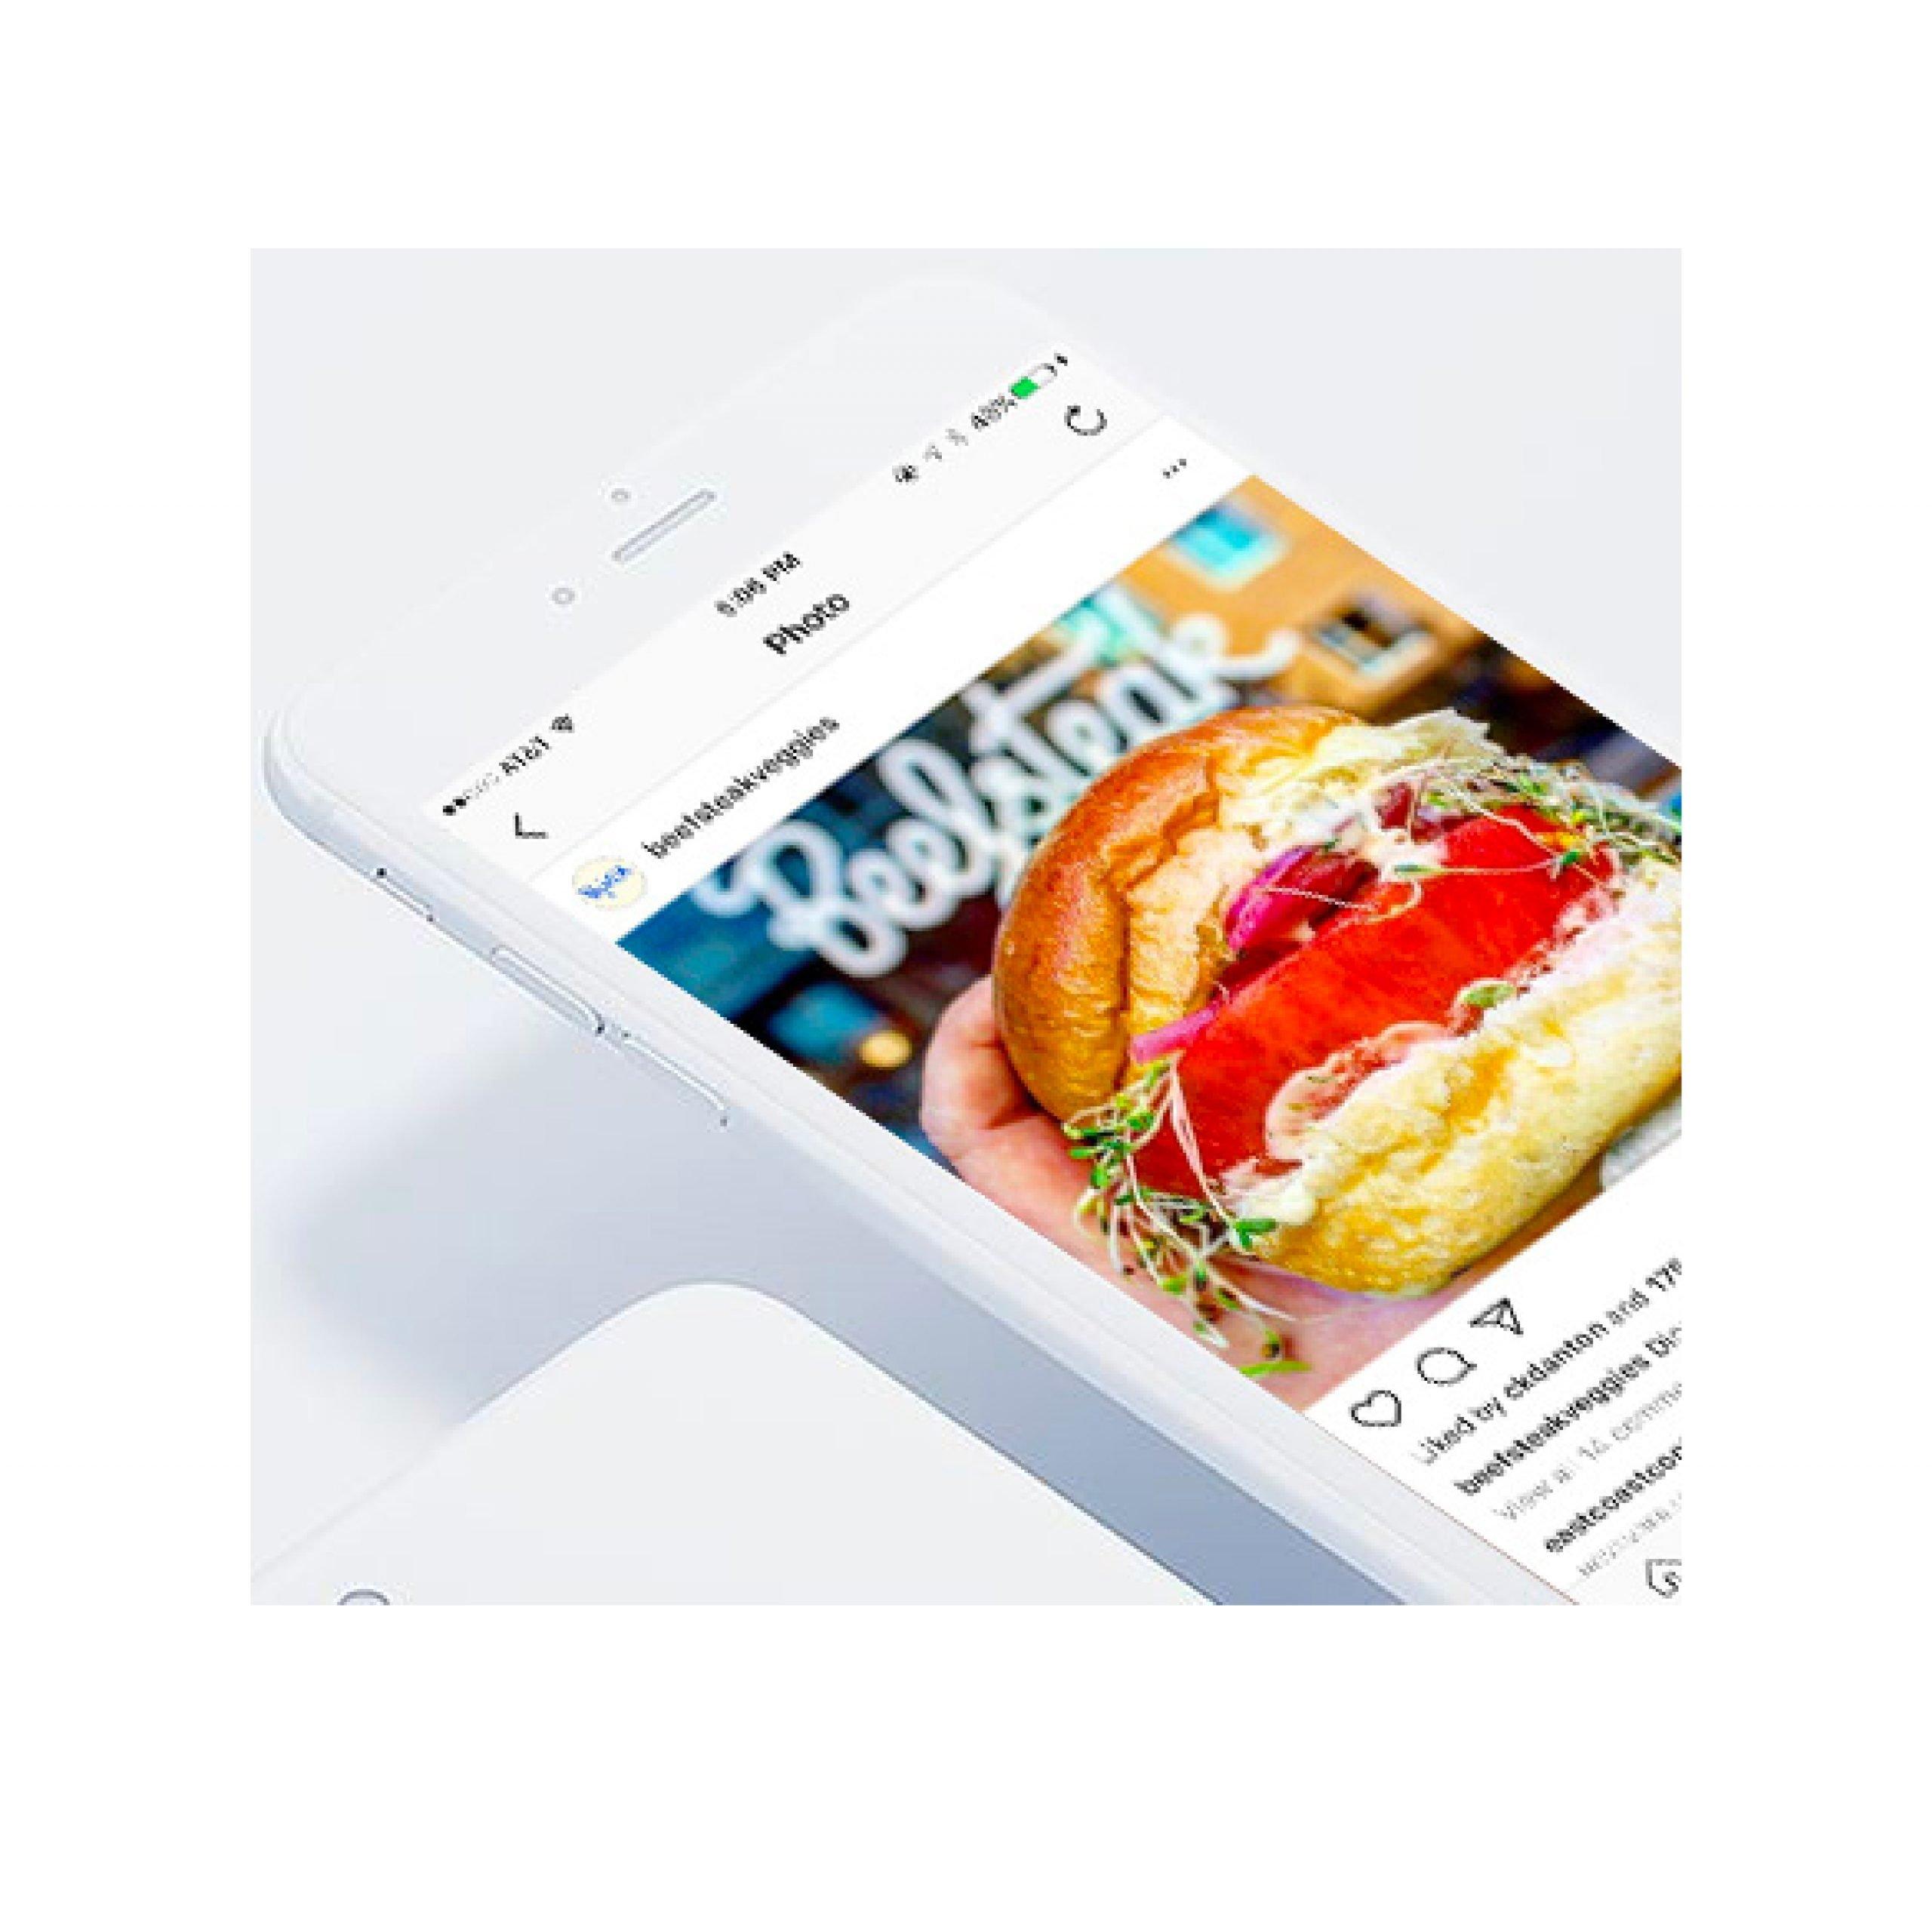 brand messaging used in social media for Beefsteak restaurants